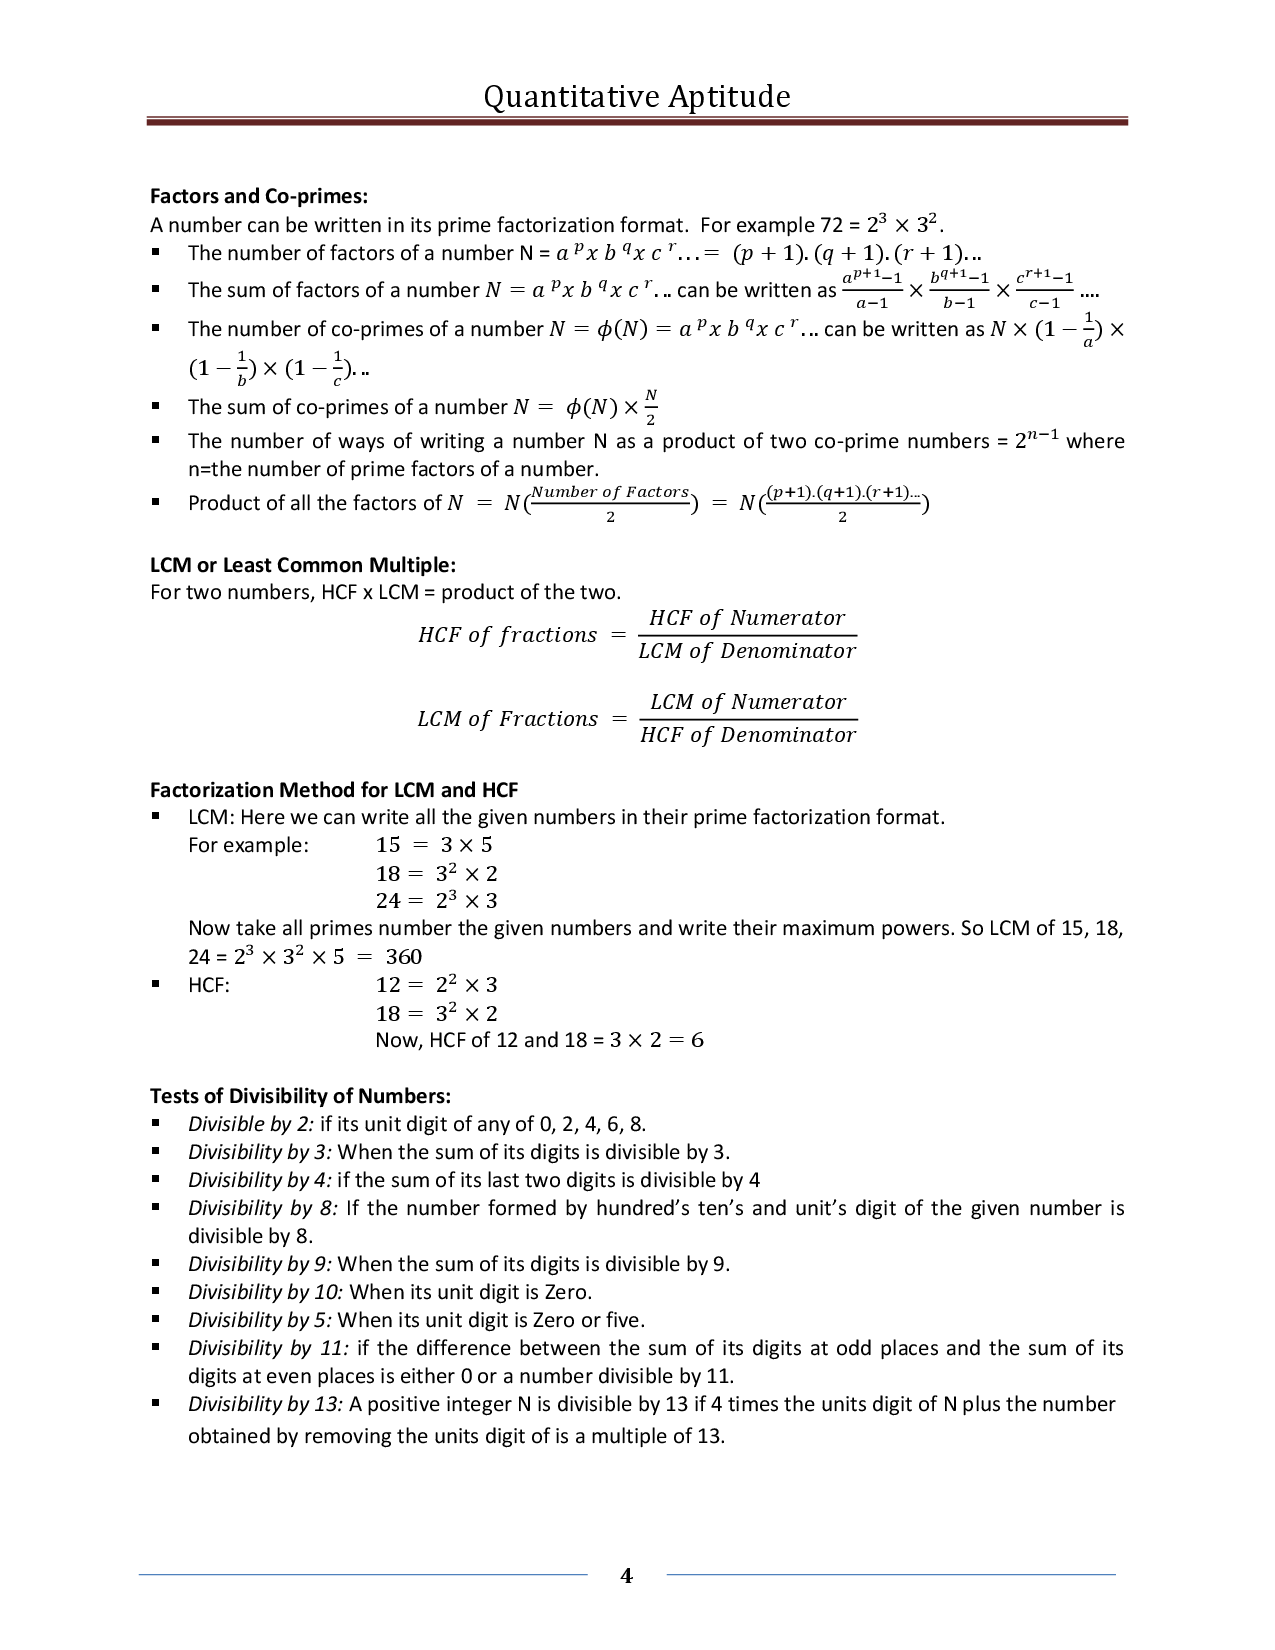 Quantitative Aptitude Formula ebook - Page 4